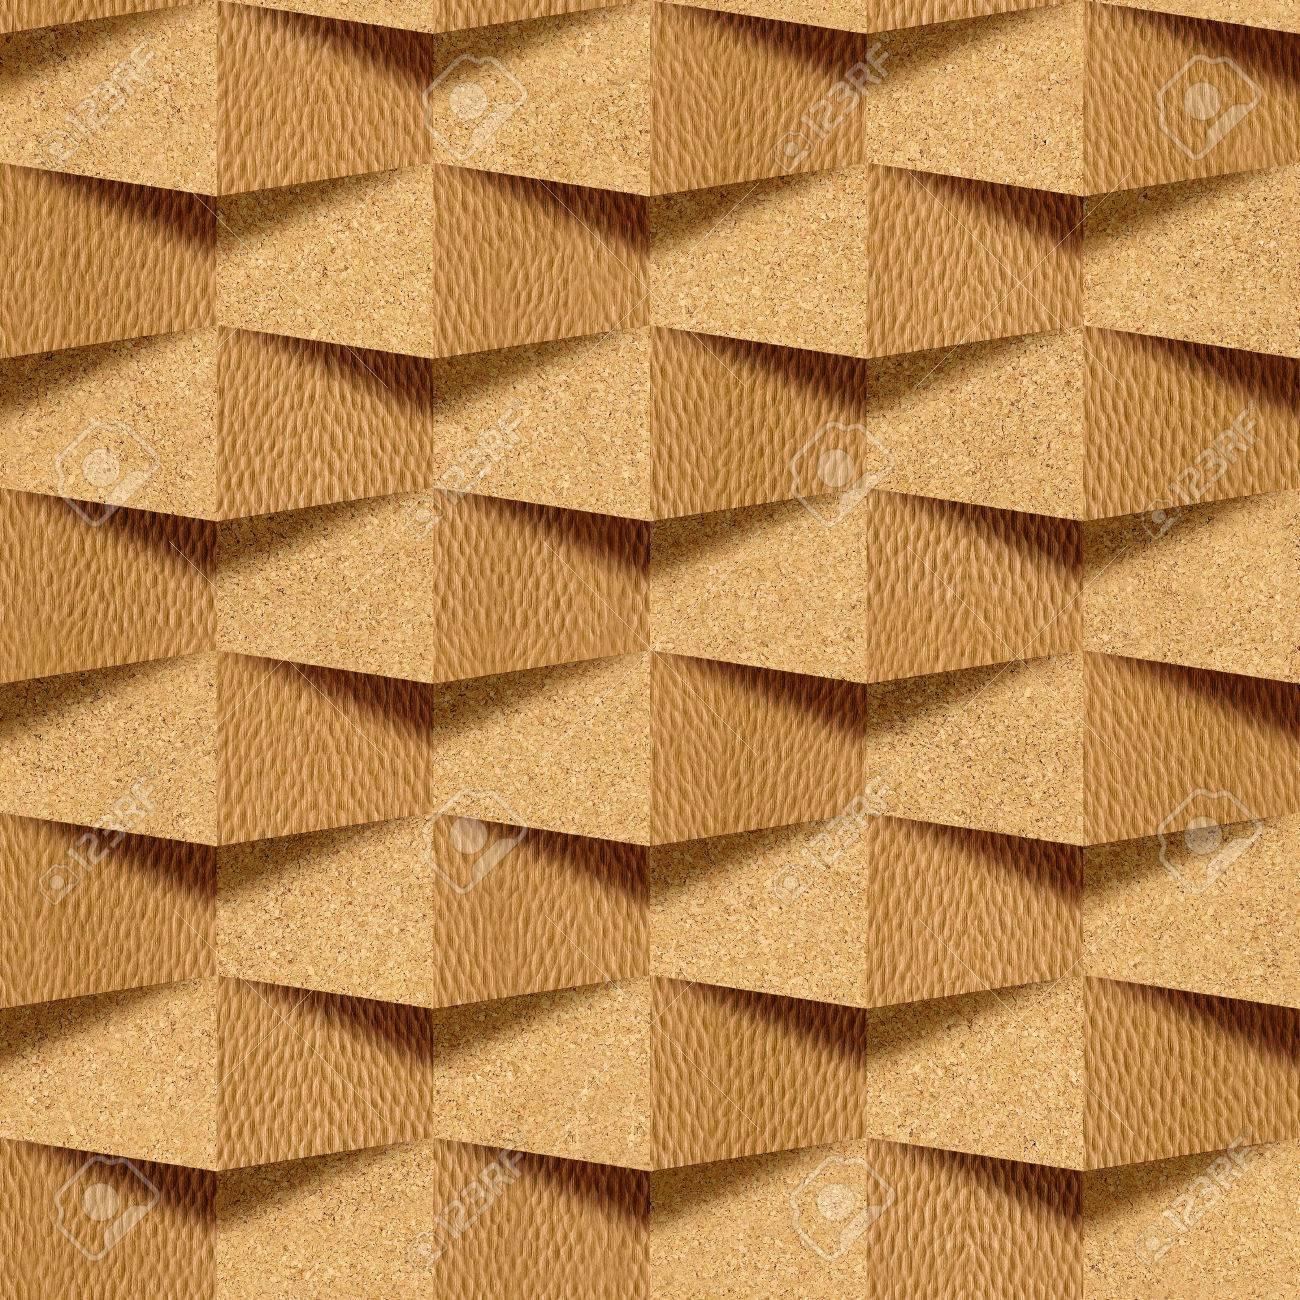 wall of the brick